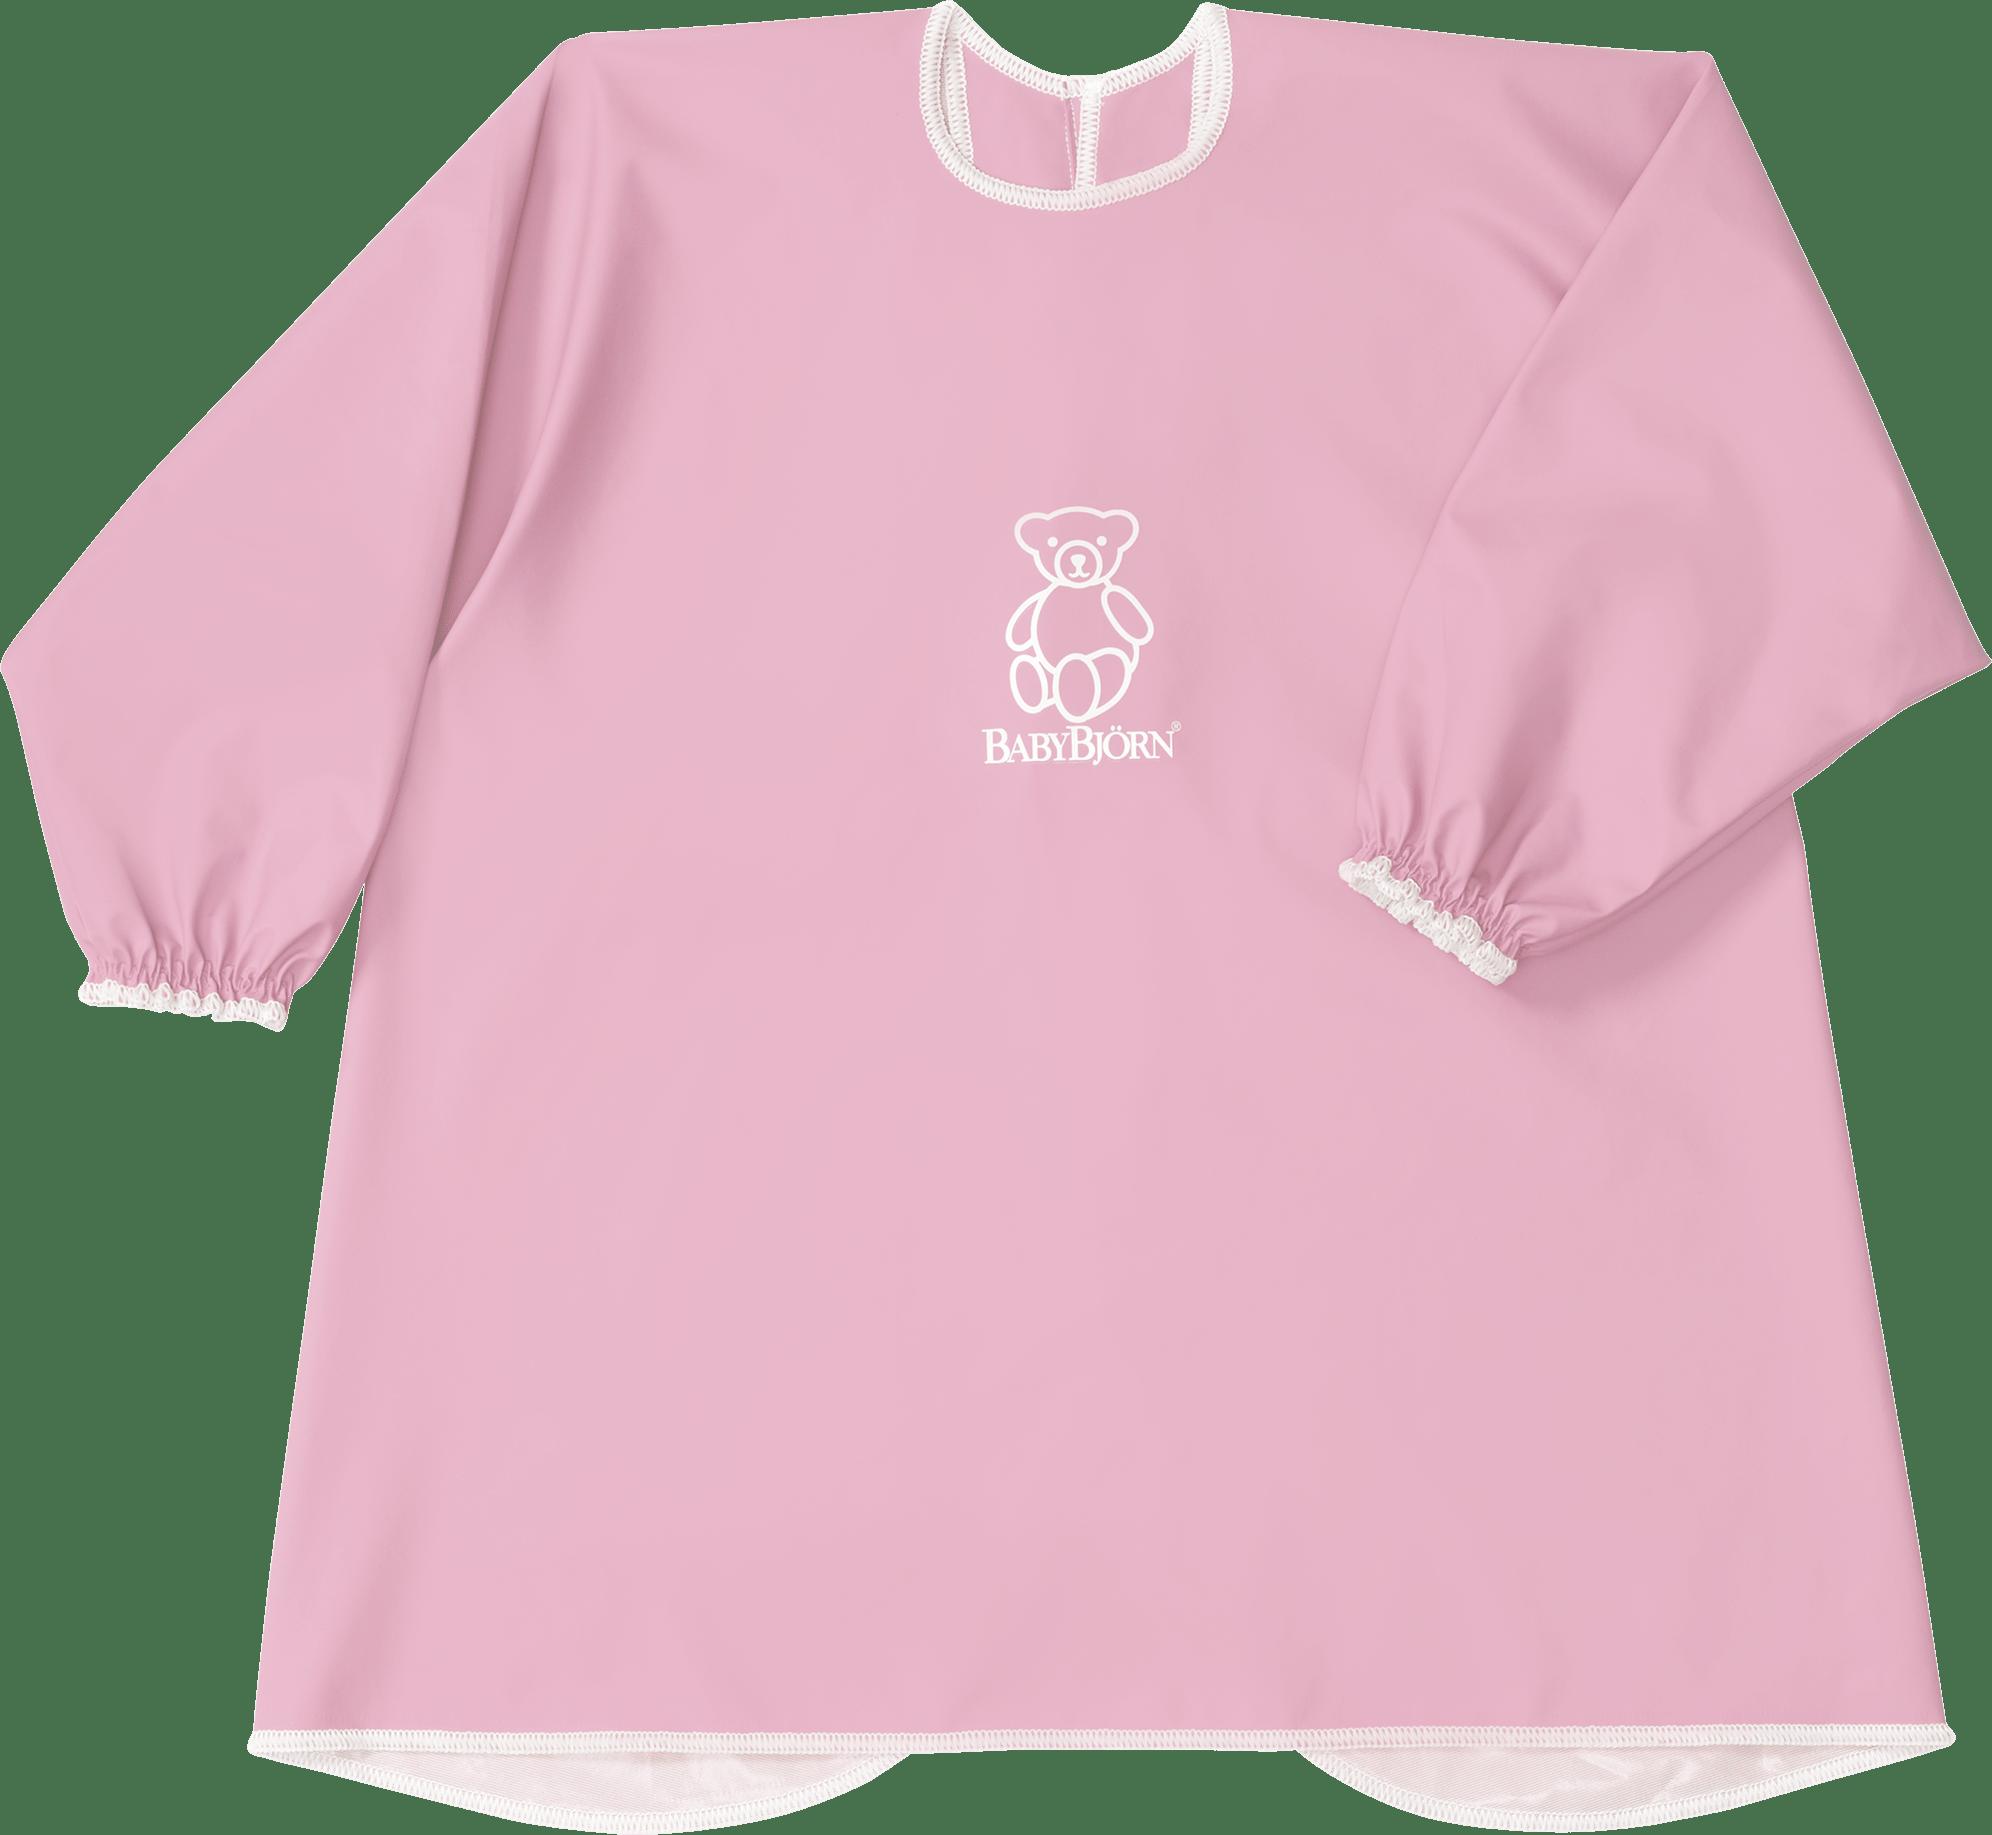 d67f495e7dfa BABYBJÖRN Long Sleeve Bib in pink BPA-free plastic, bib and apron in one